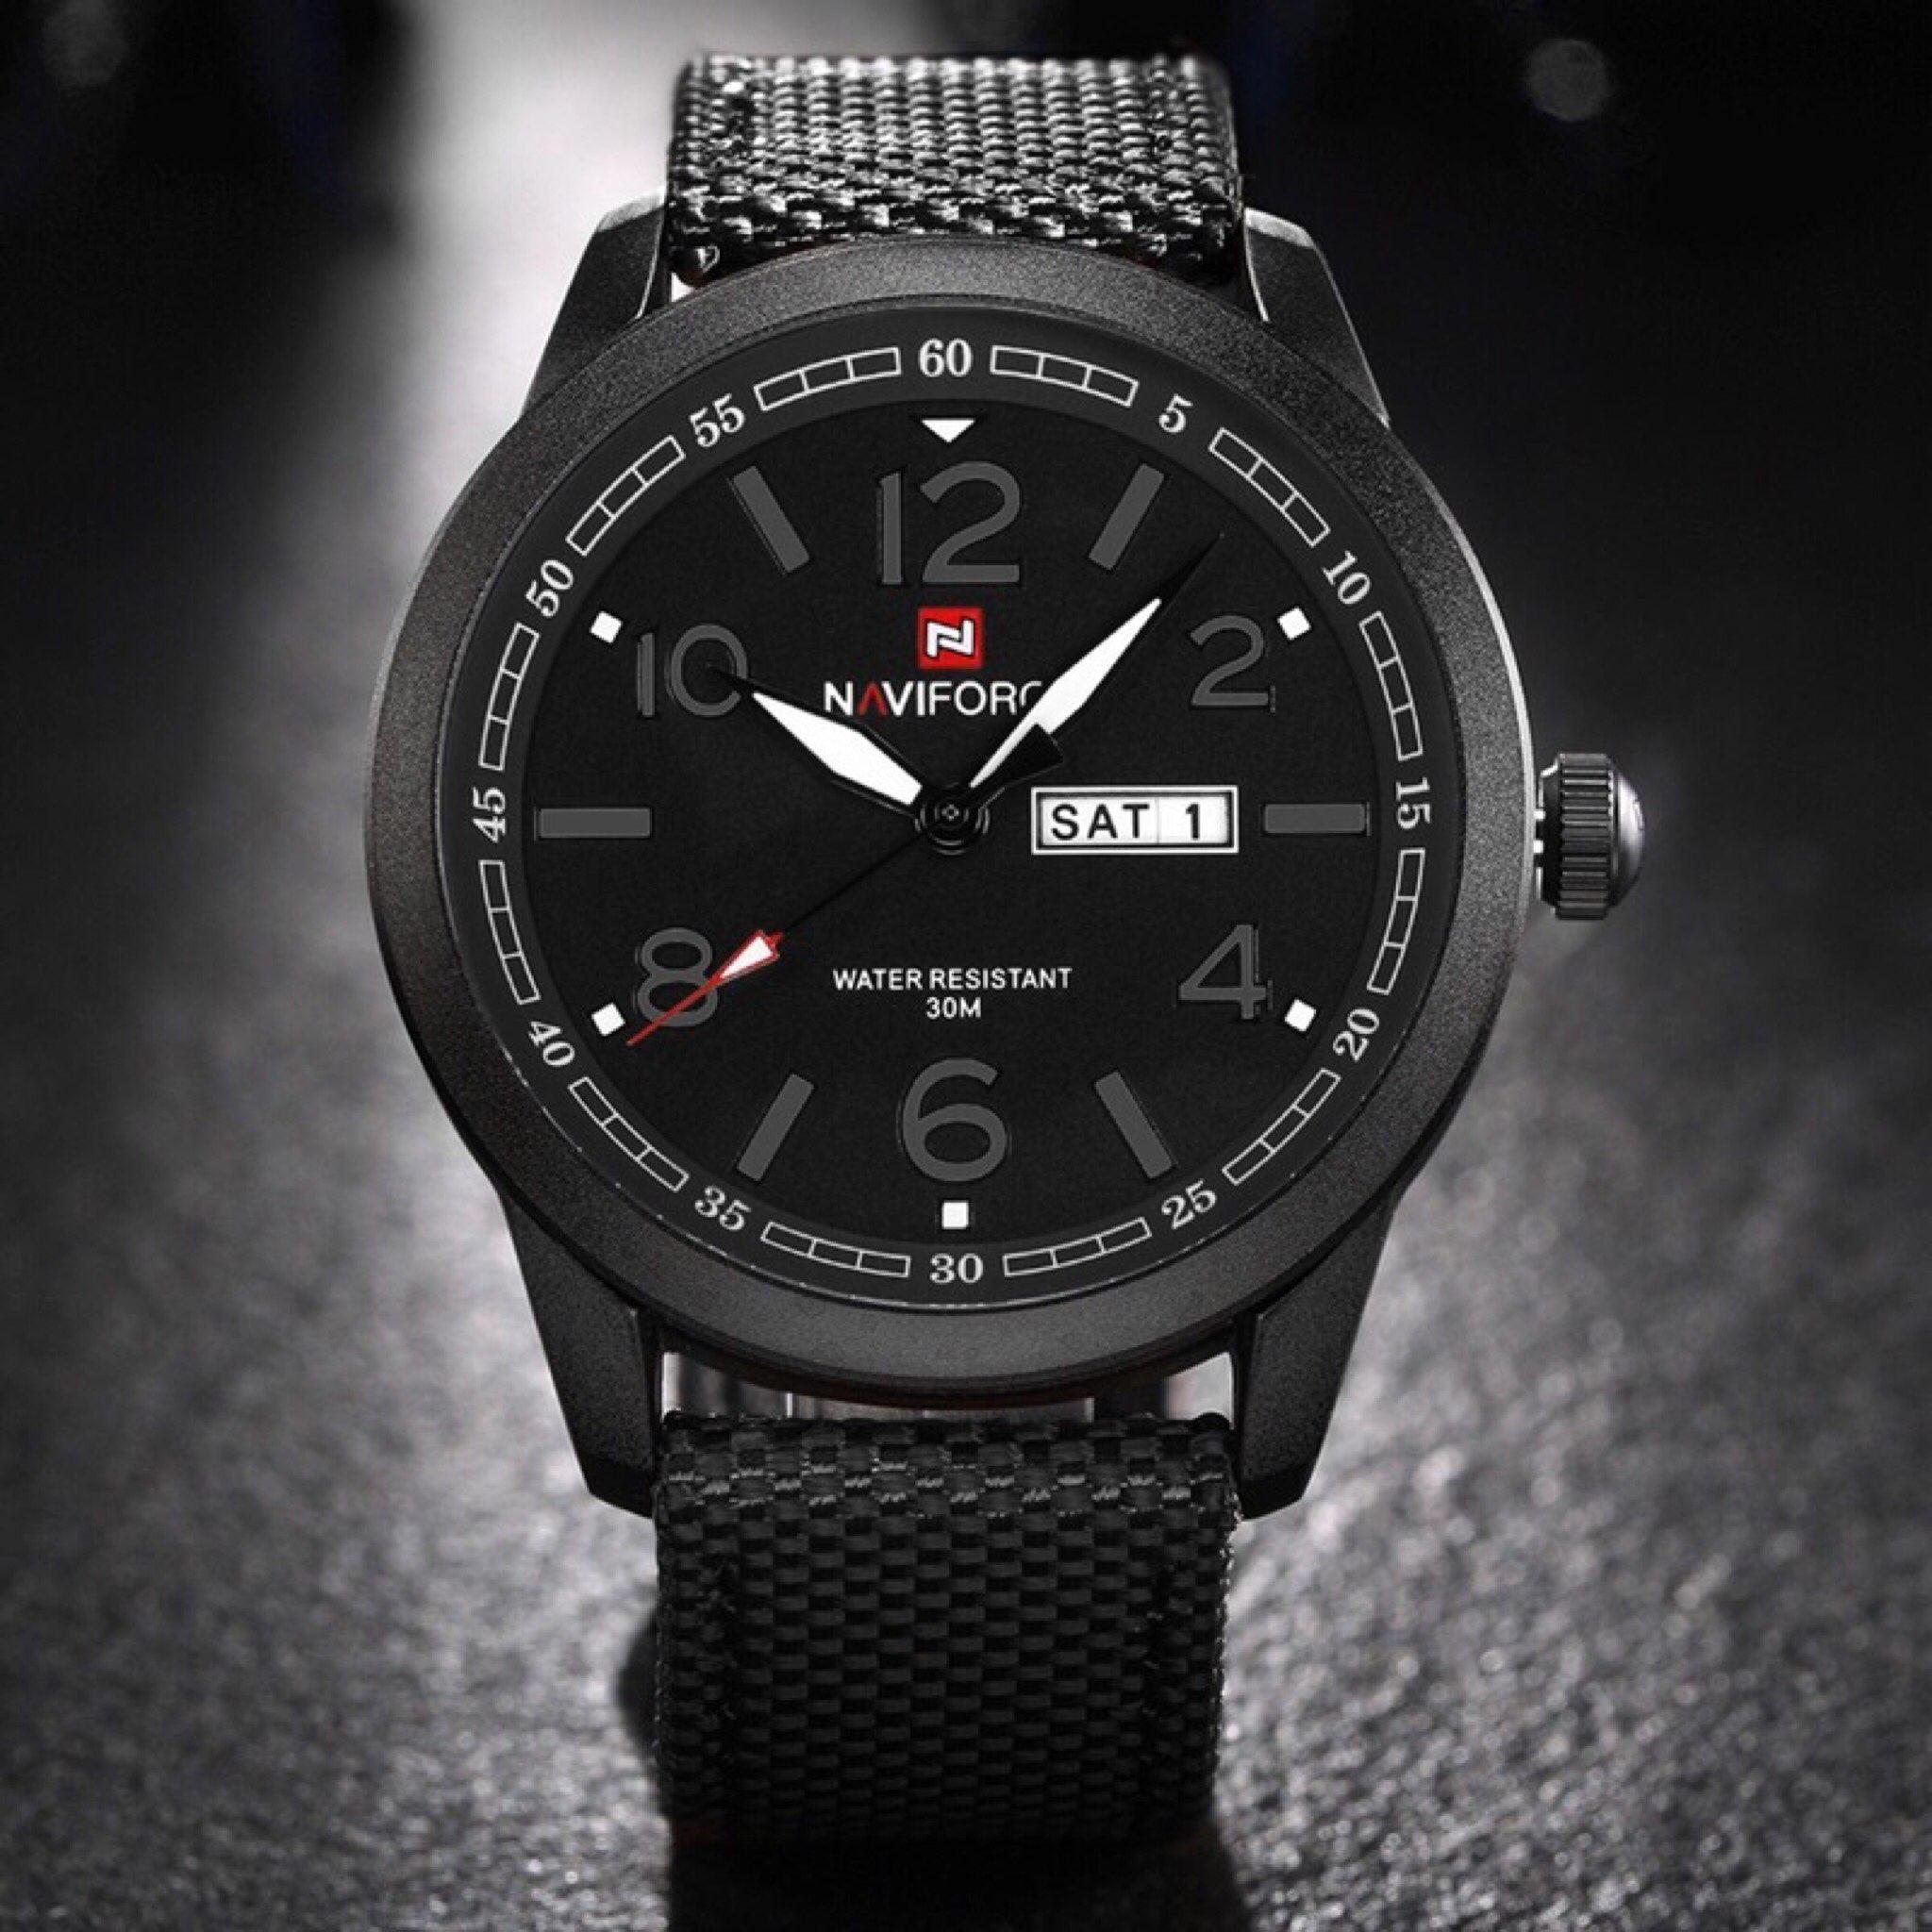 4dd0032ba ساعة رجالية s10 ماركة NAVIFORCE | M7store